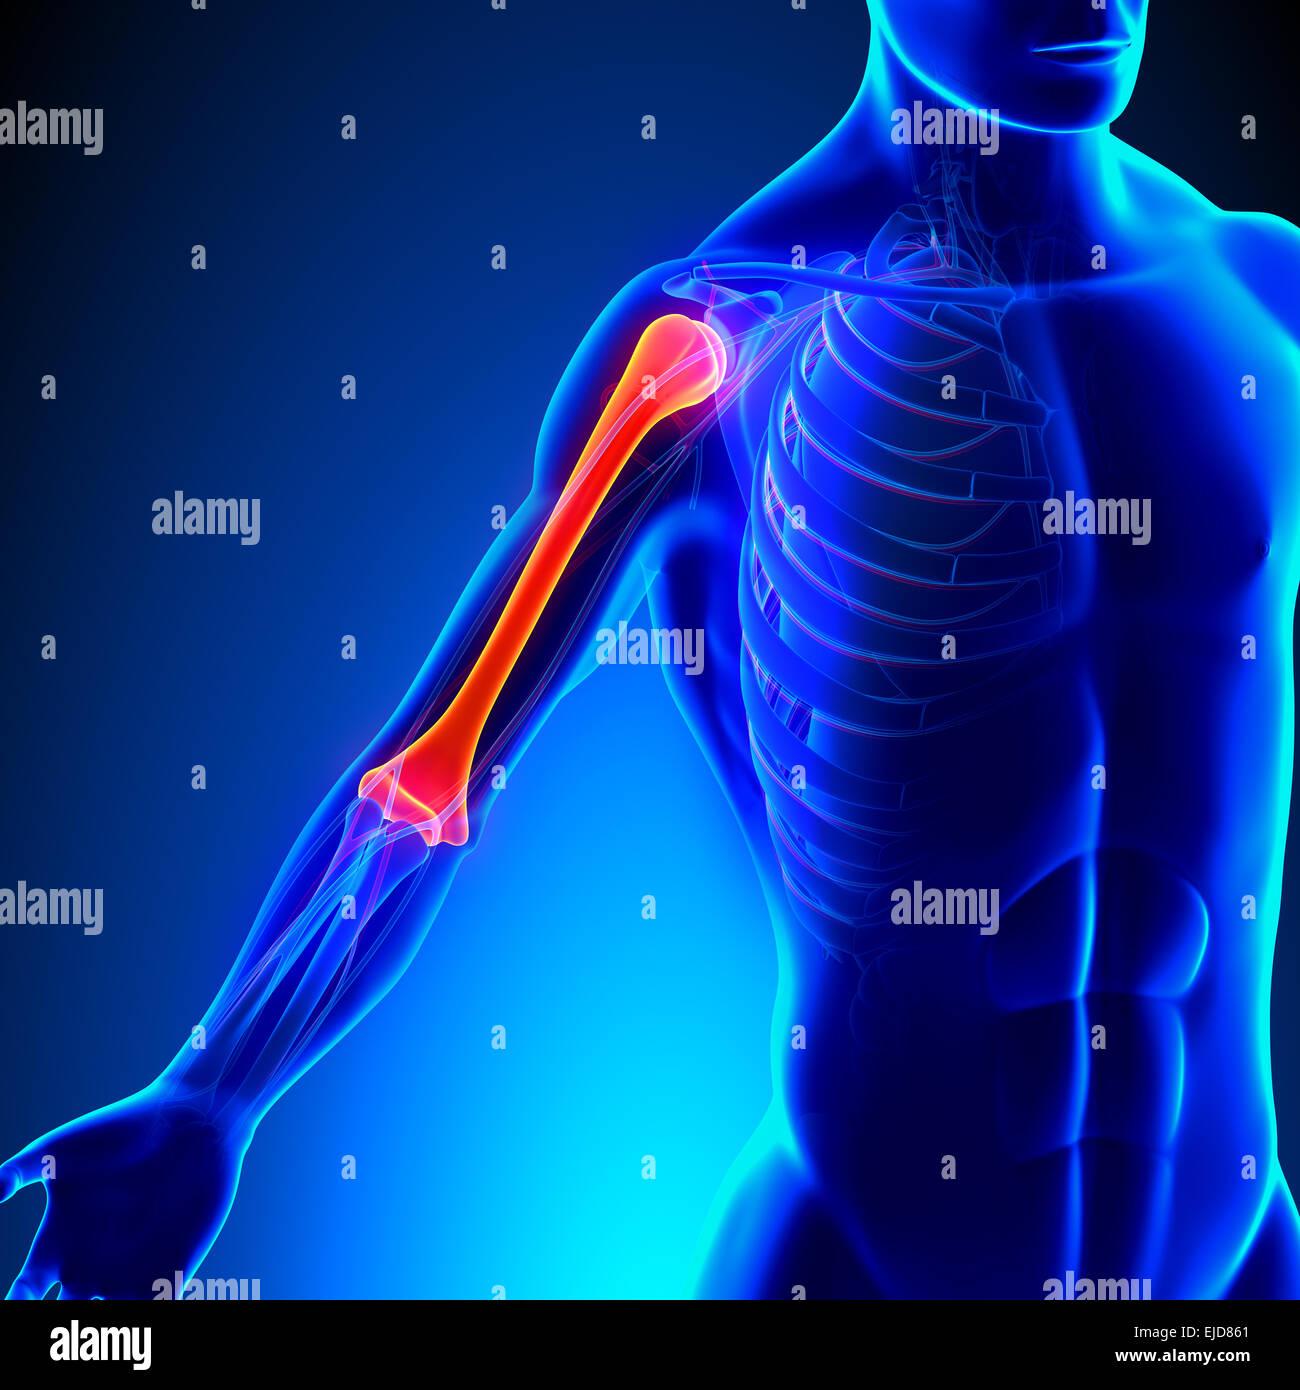 Humerus Anatomy with Circulatory System Stock Photo: 80197097 - Alamy